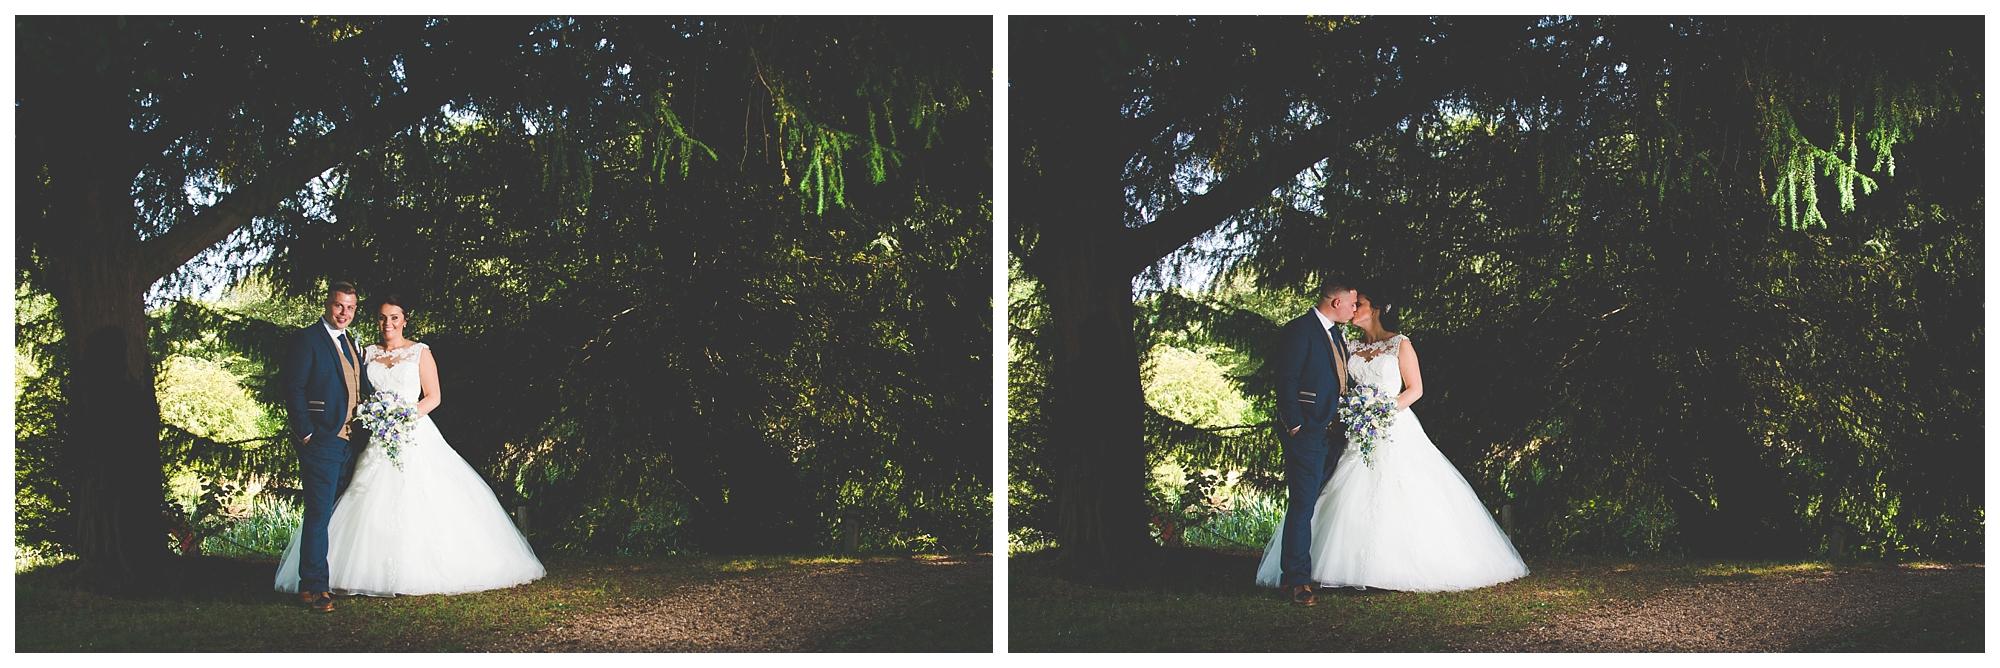 Bagden-Hall-Wedding-Photography_0055